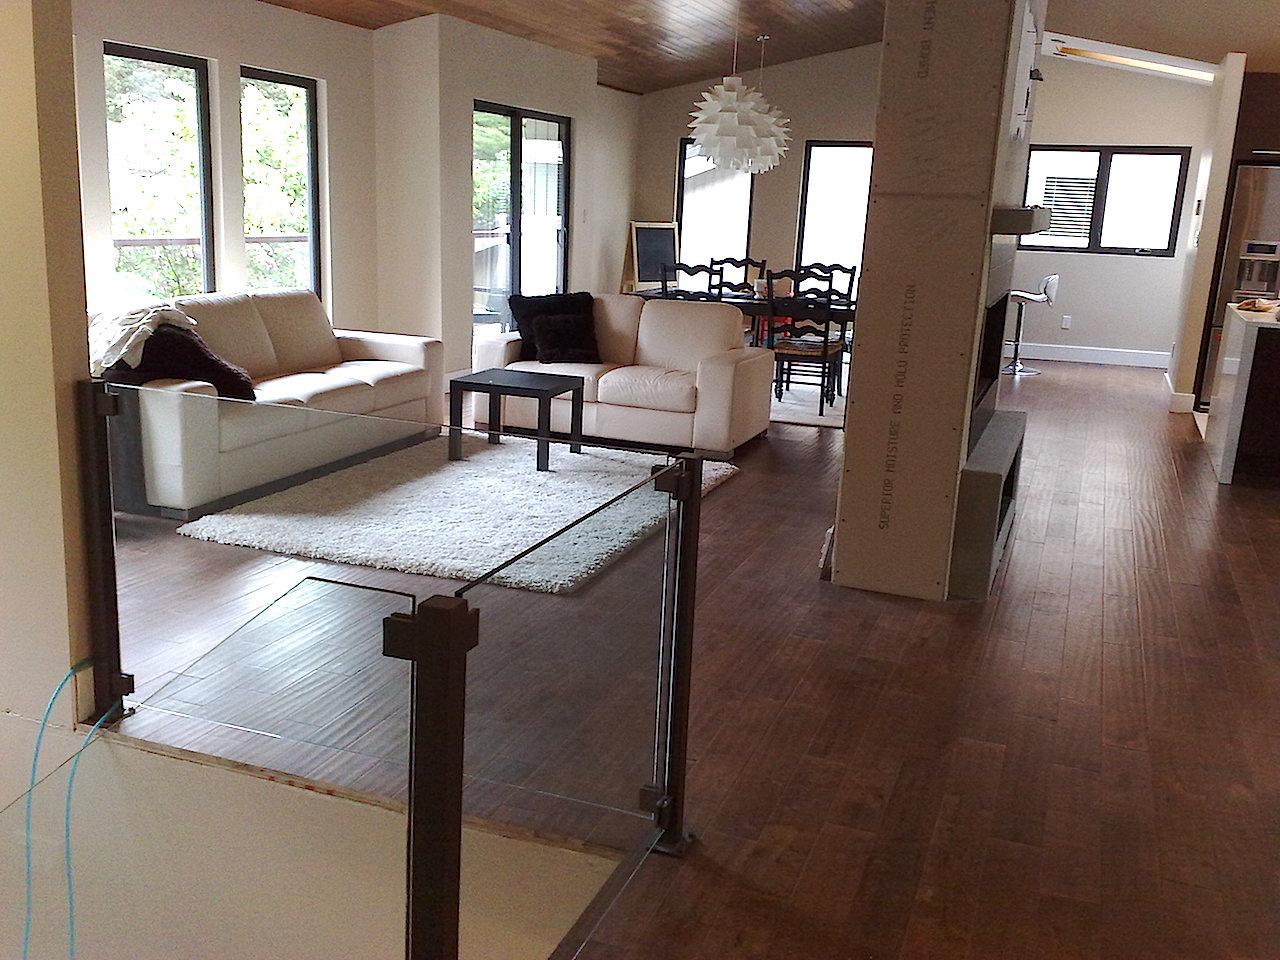 Modern Living room with hardwood floors